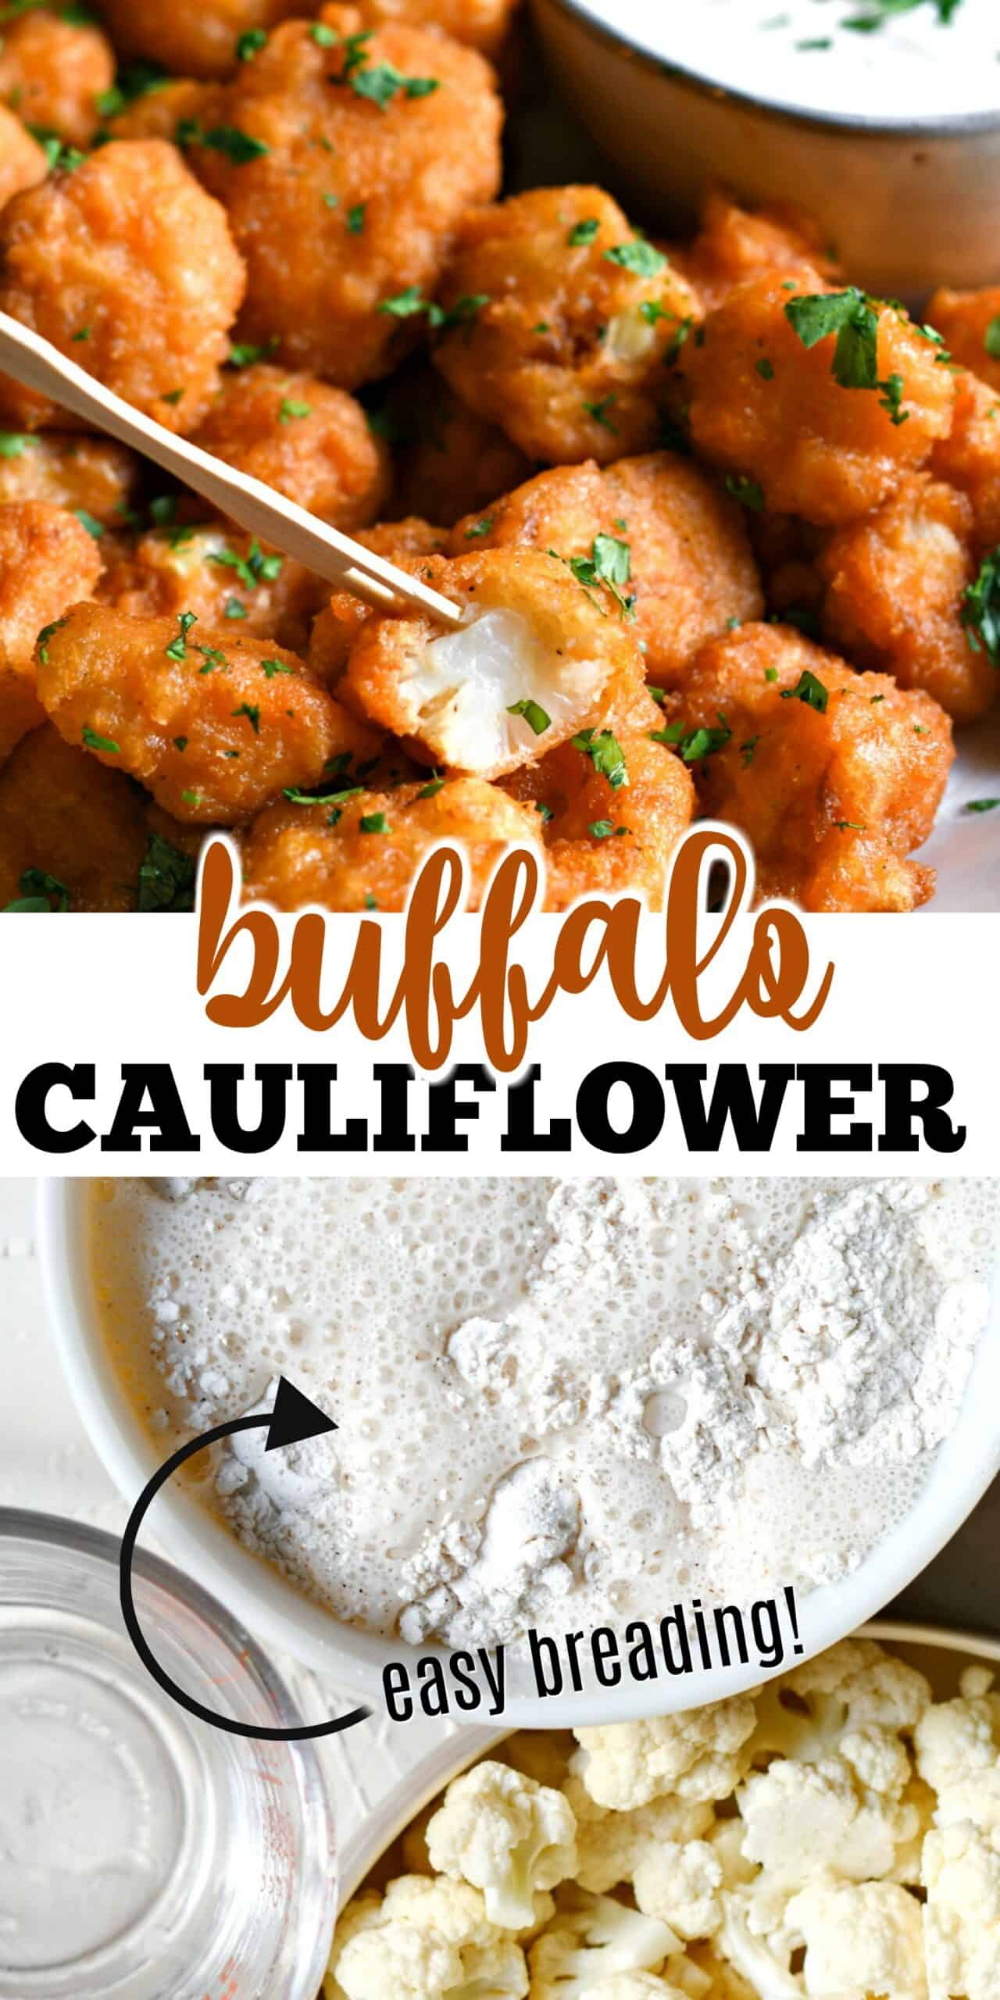 Crispy Vegan Cauliflower Wings Tossed With Homemade Buffalo Sauce Are So Delicious You Won T Even M In 2020 Vegan Cauliflower Wings Cauliflower Wings Vegan Cauliflower